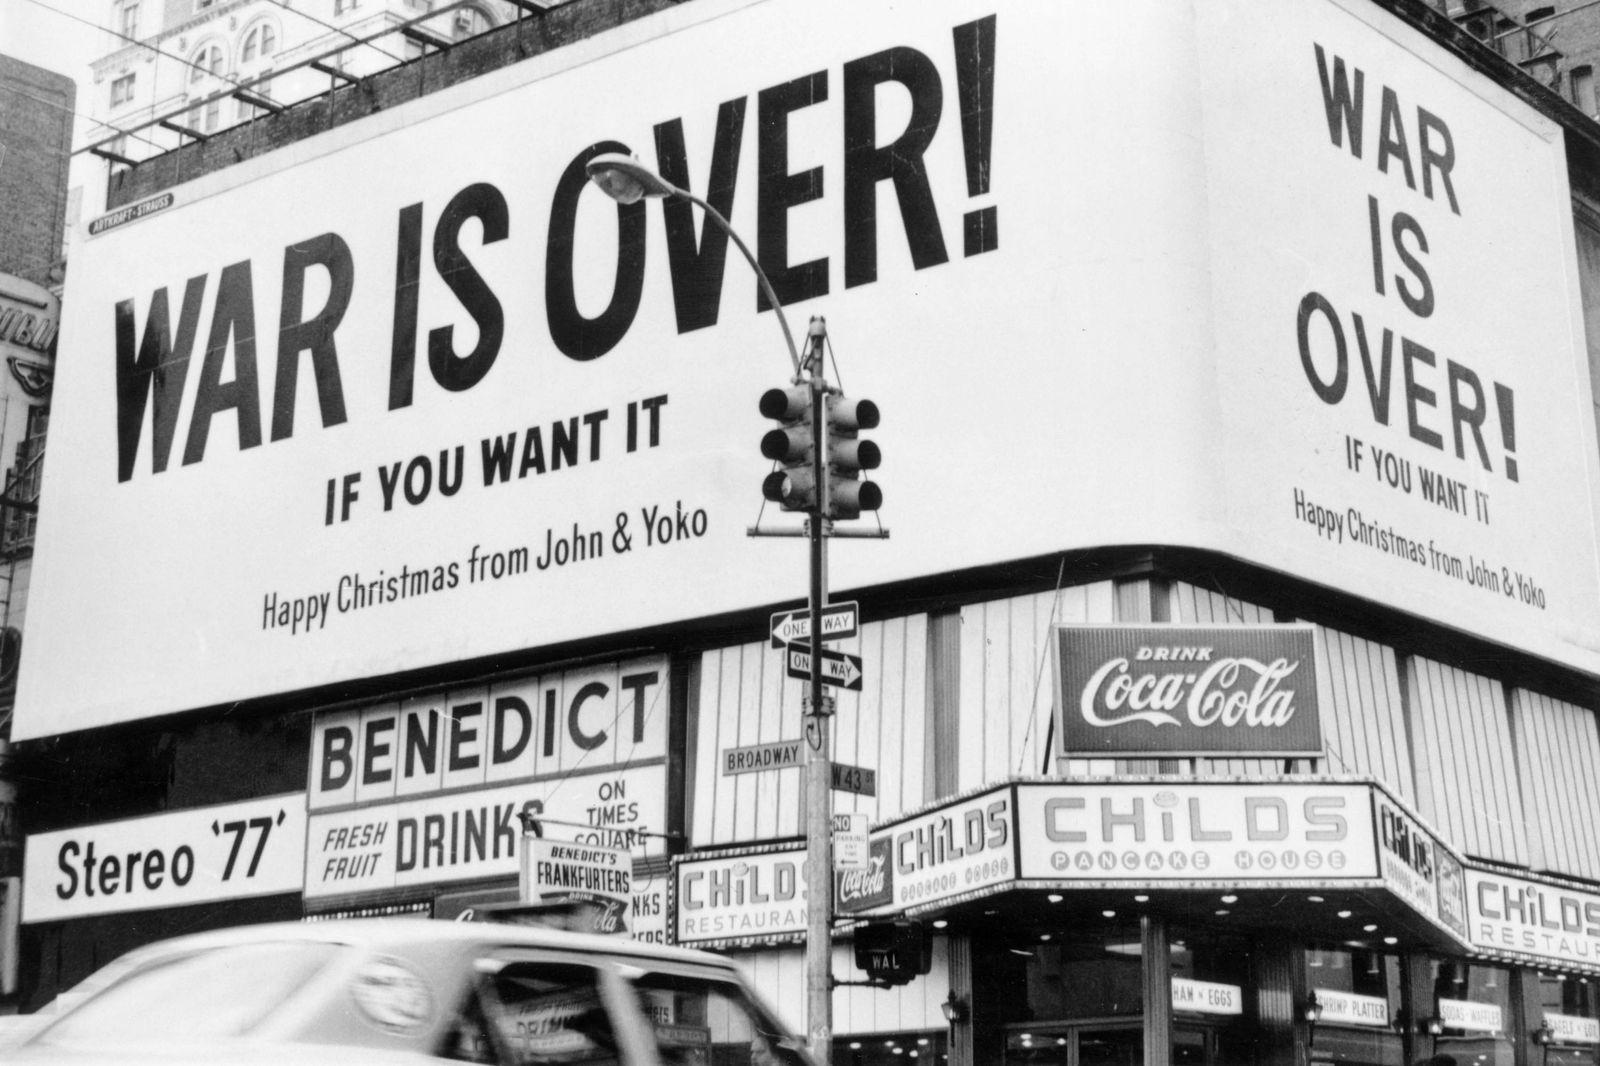 New York In The 70s The Photos John Lennon And Yoko John Lennon Yoko Ono Peace